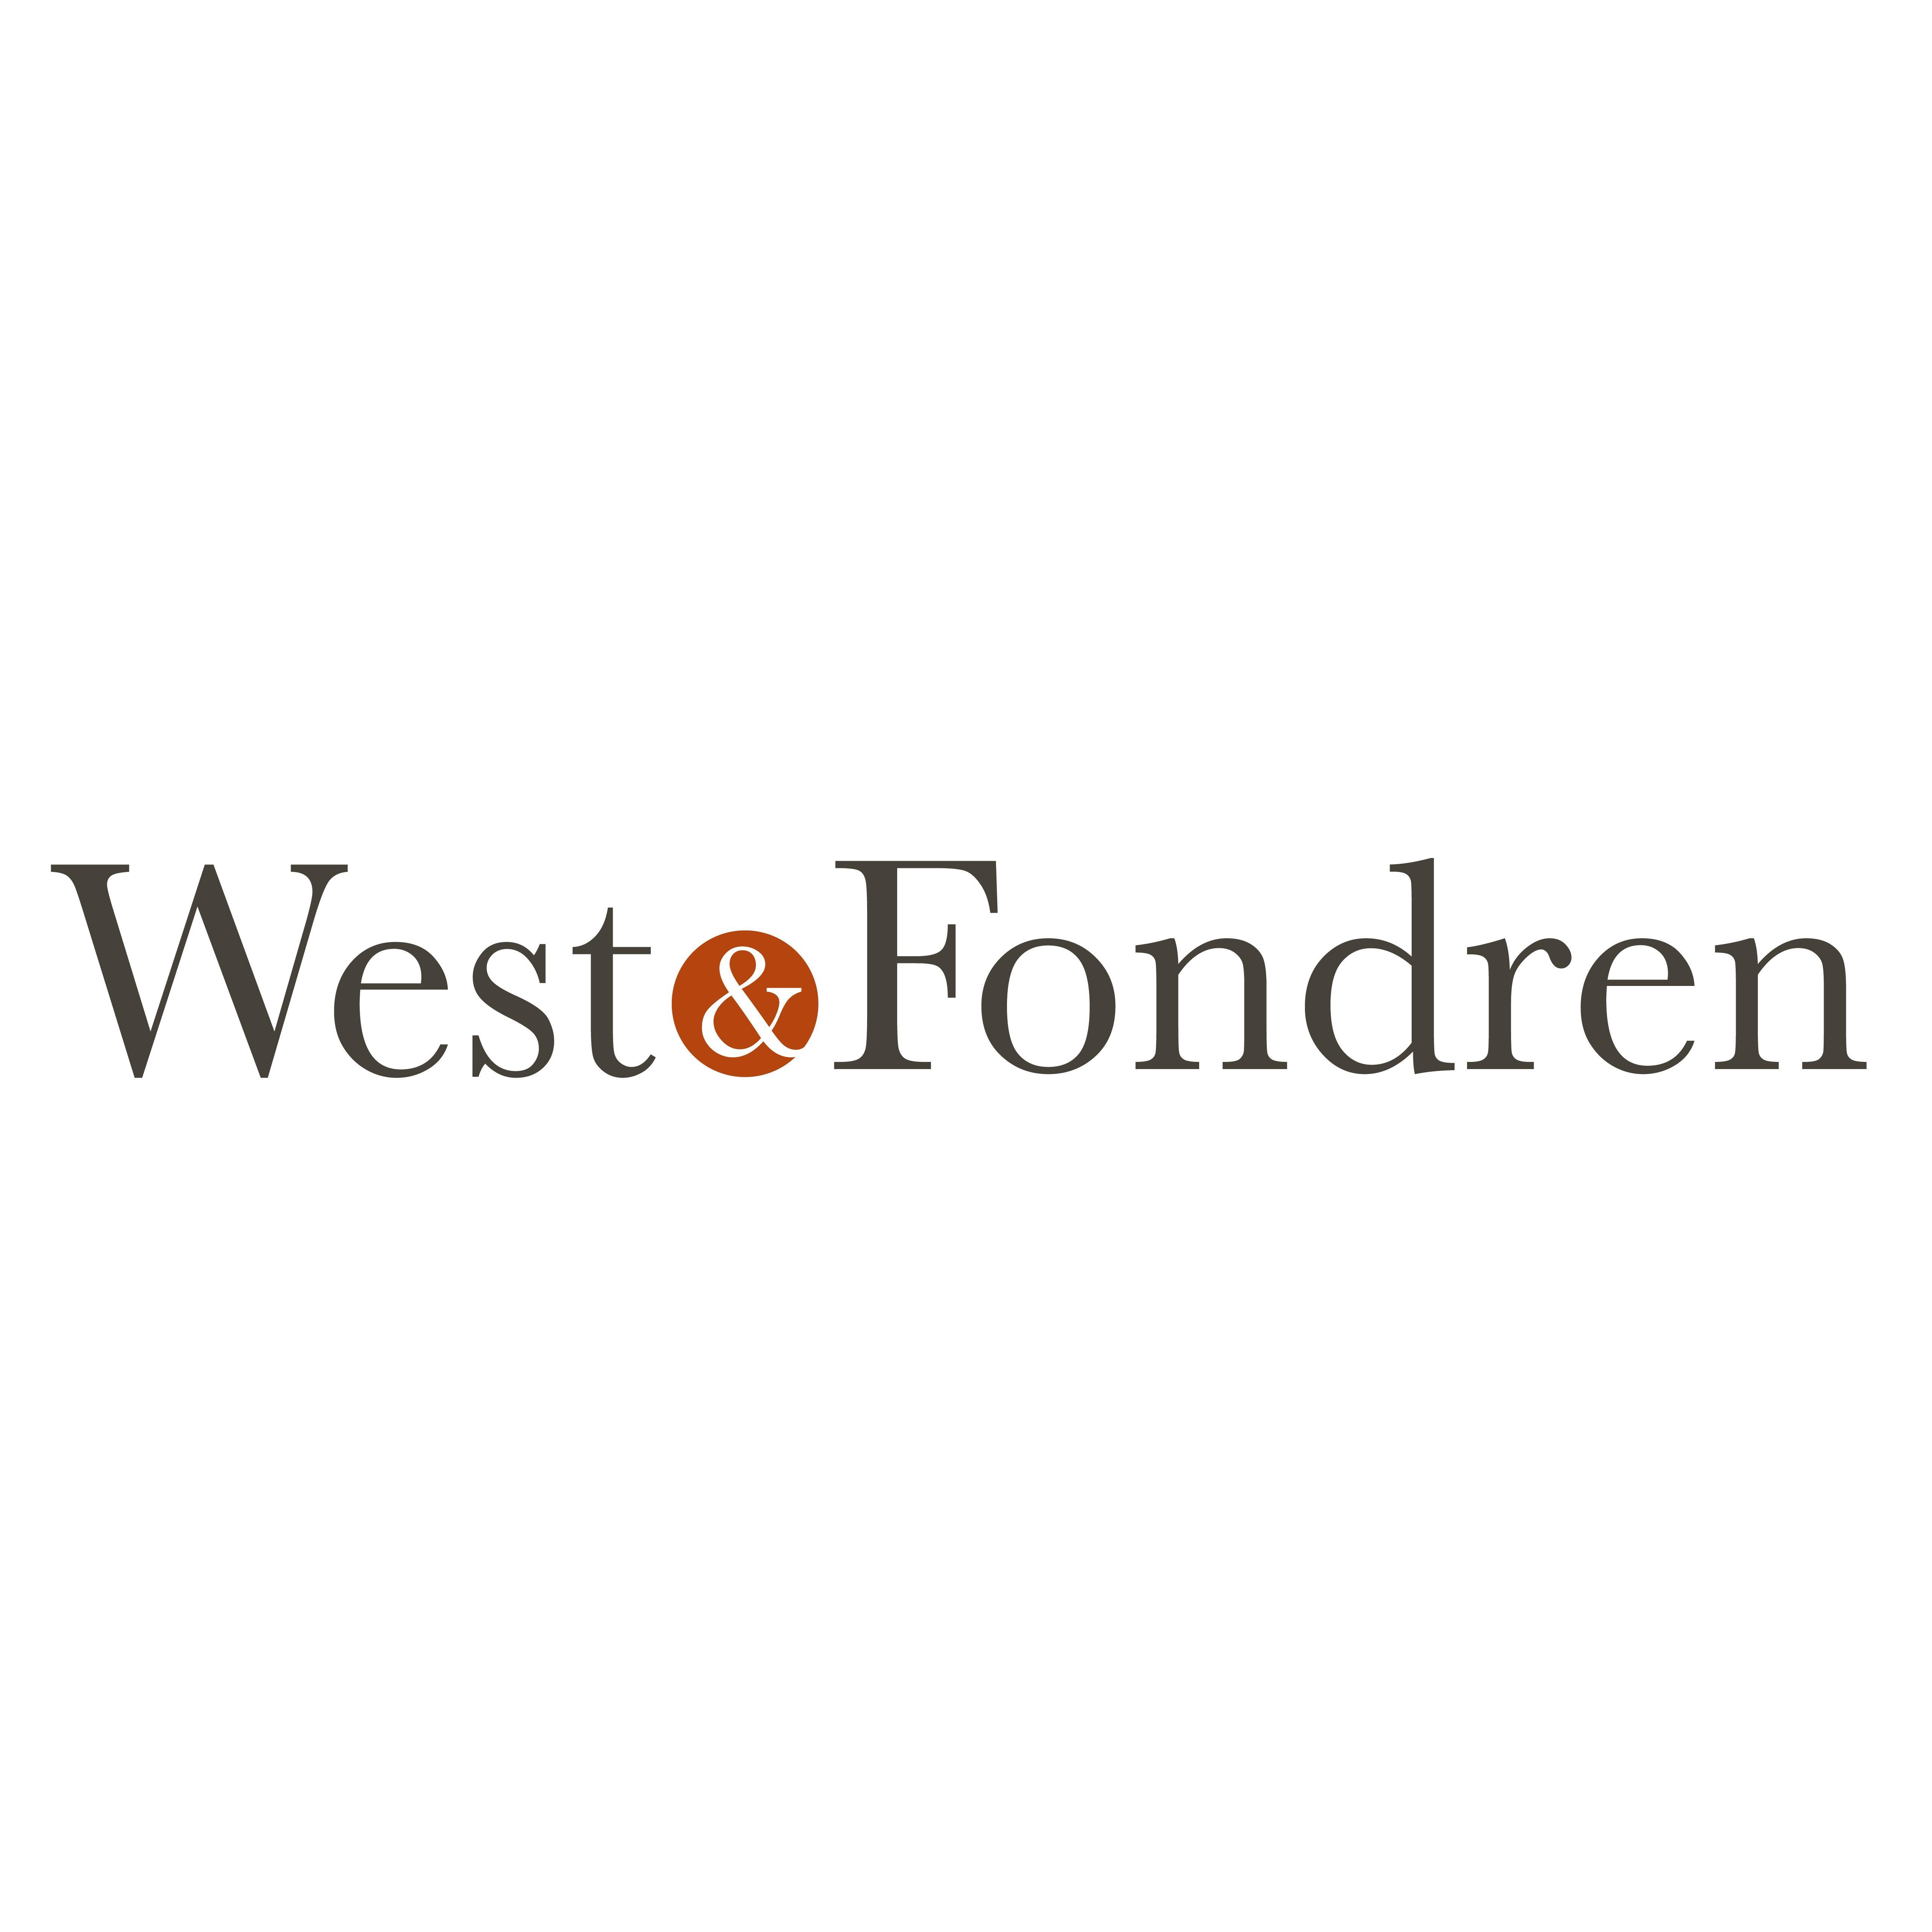 West & Fondren Apartments